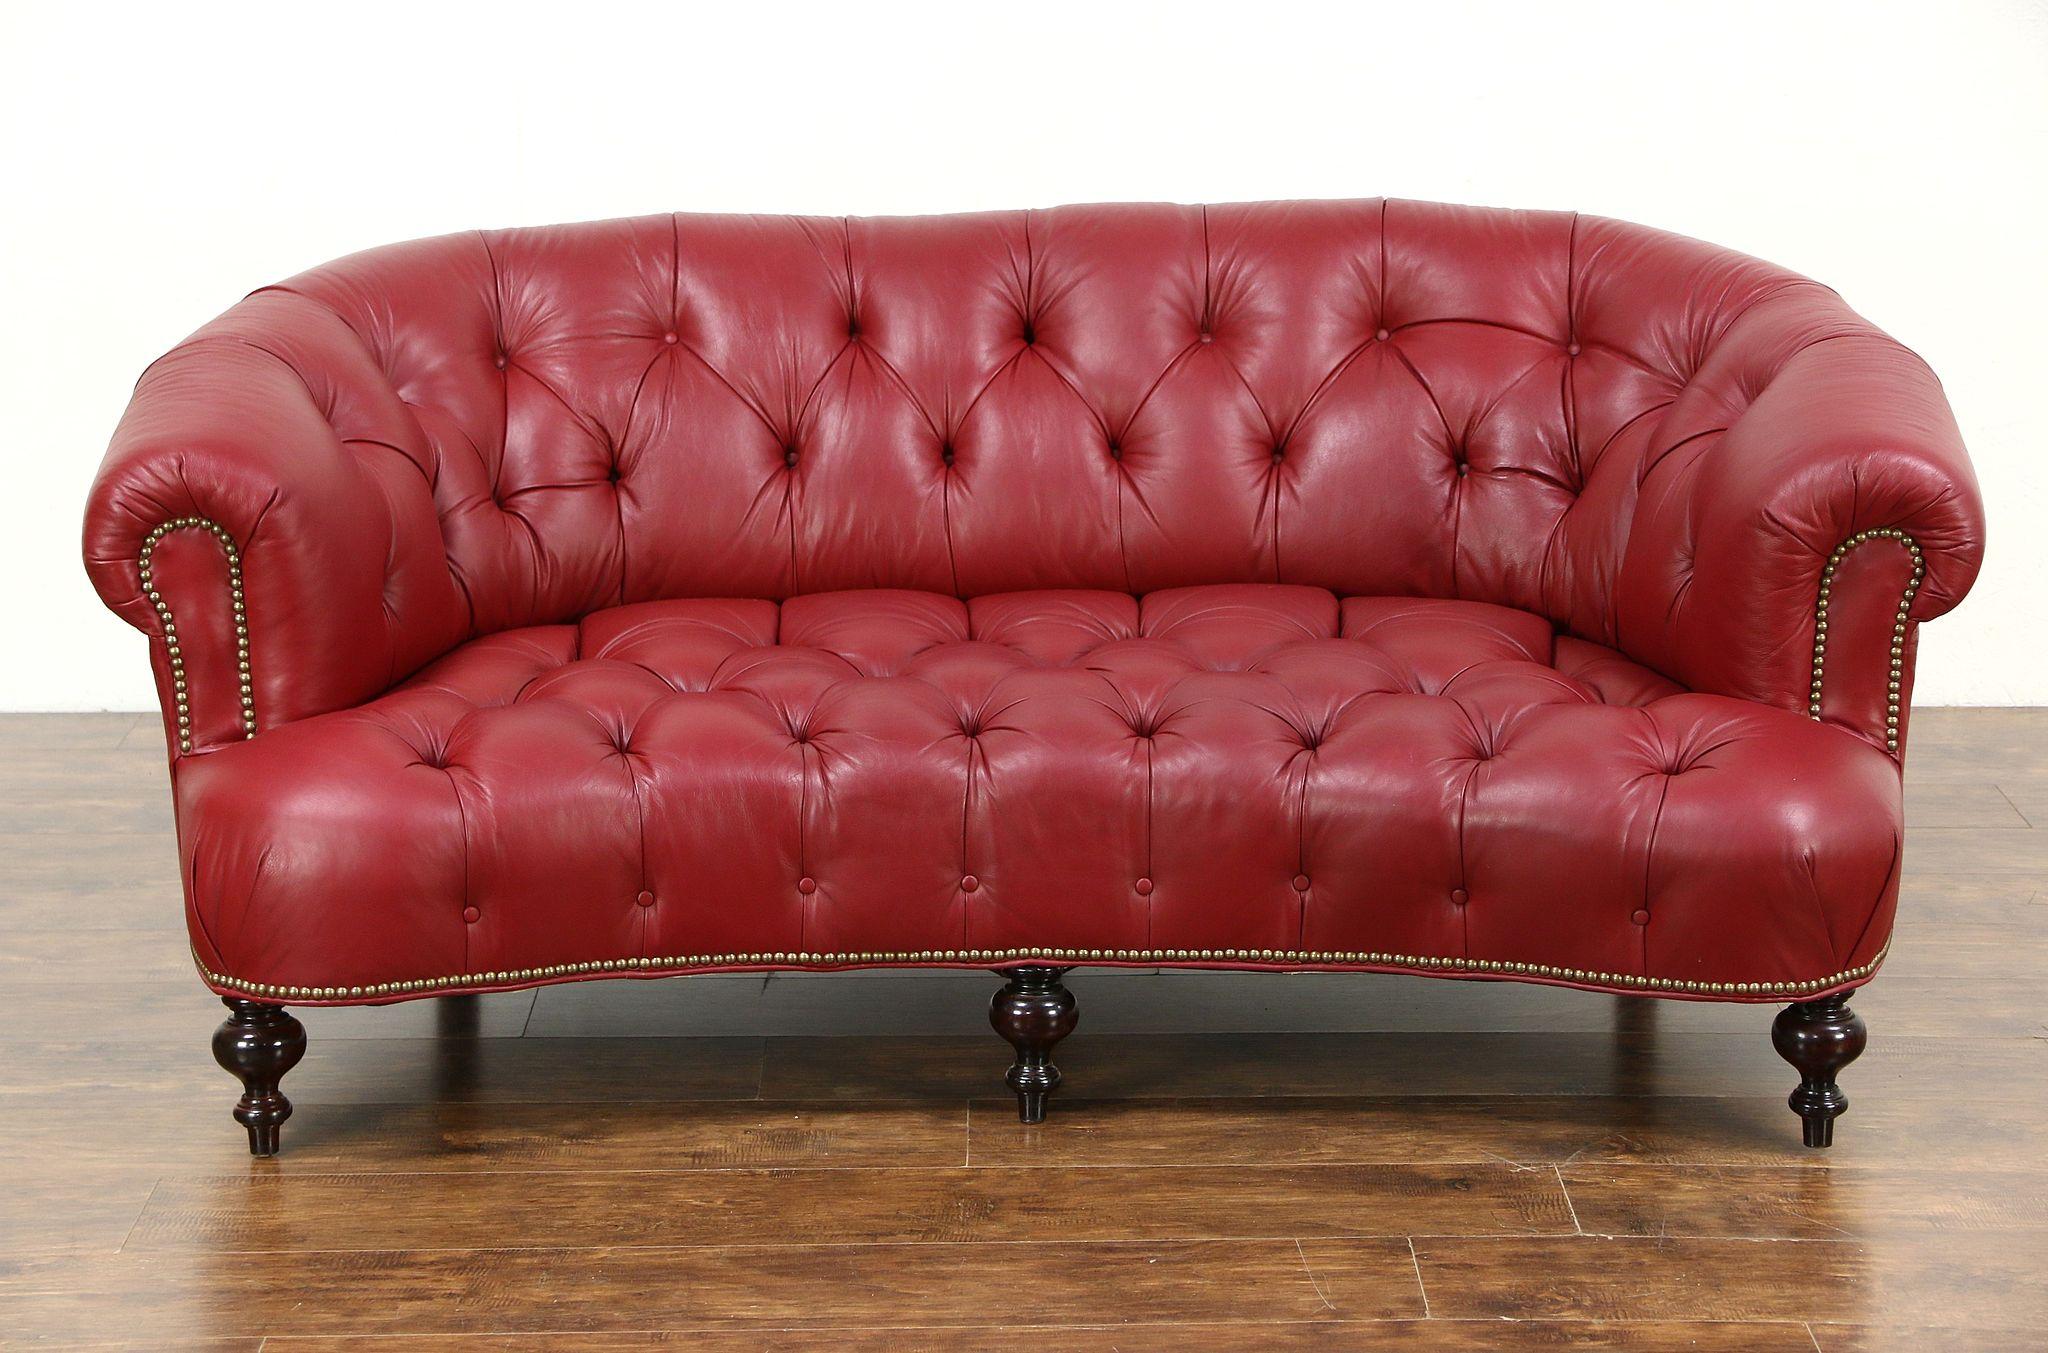 tufted nailhead leather sofa contemporary leather tufted. Black Bedroom Furniture Sets. Home Design Ideas